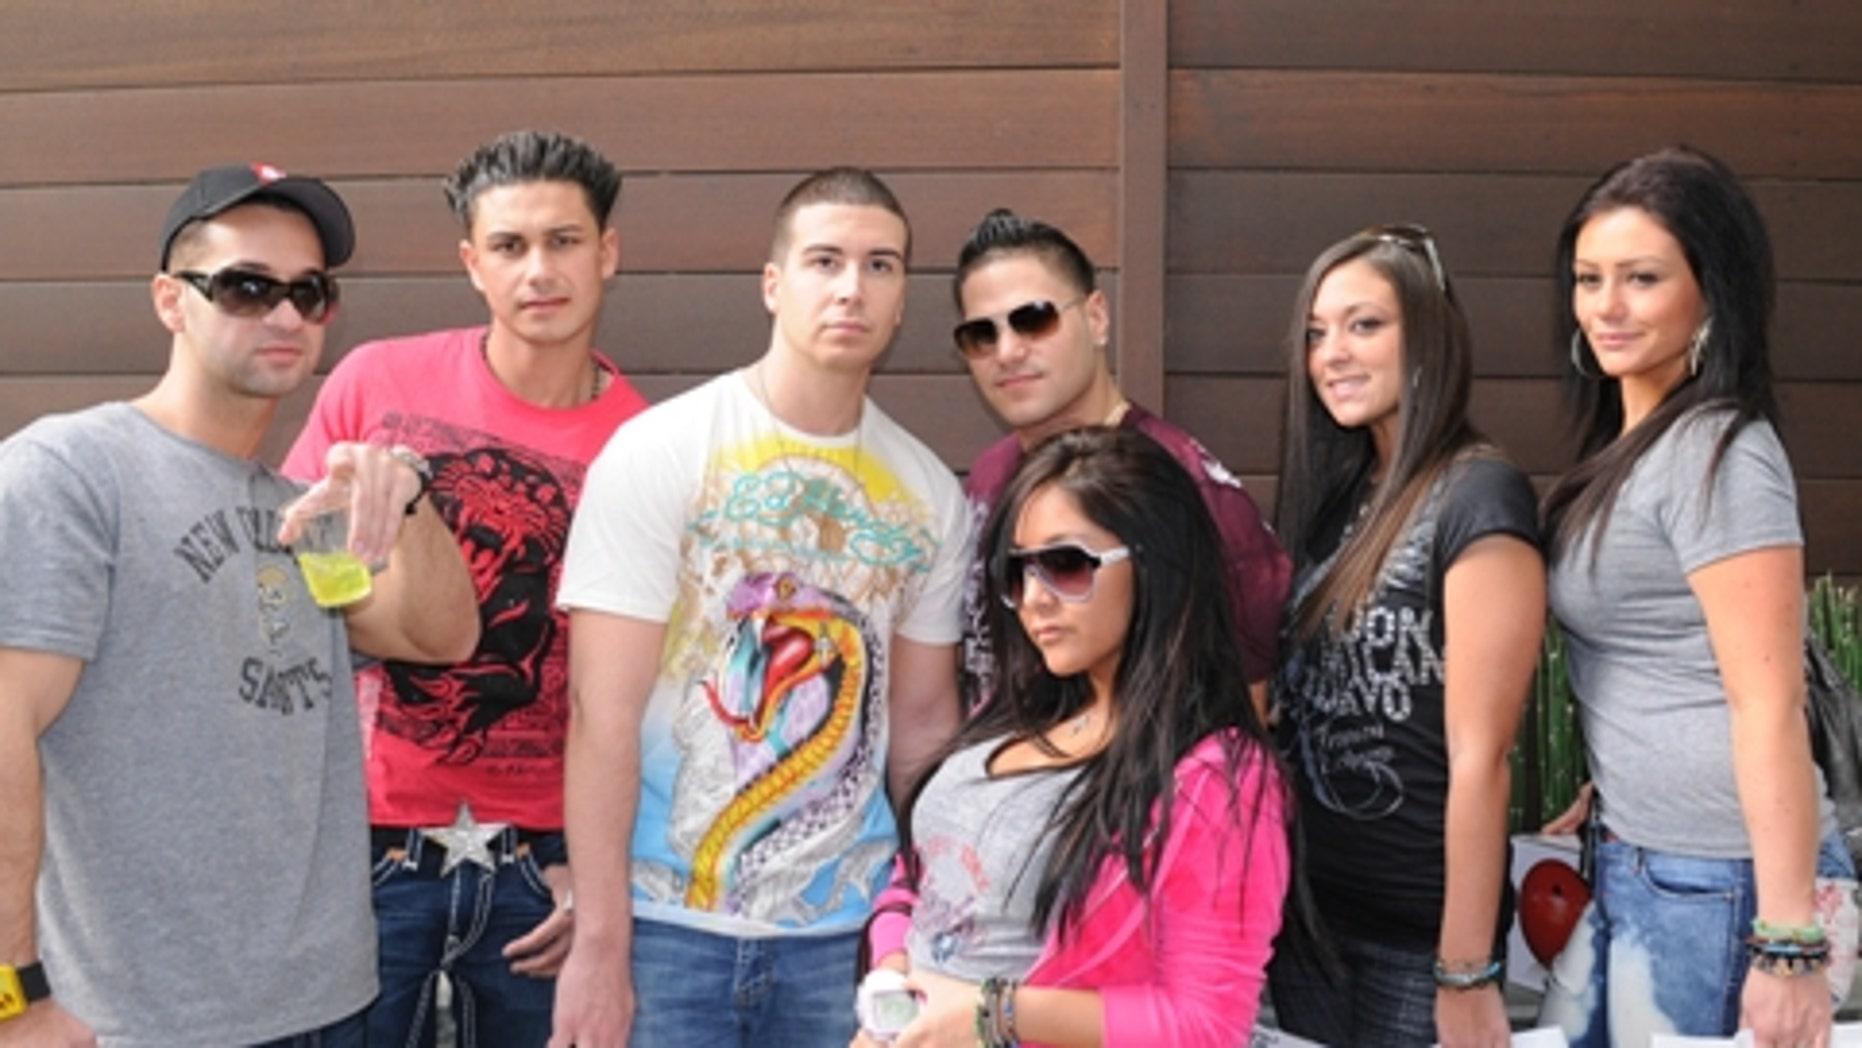 The 'Jersey Shore' Cast